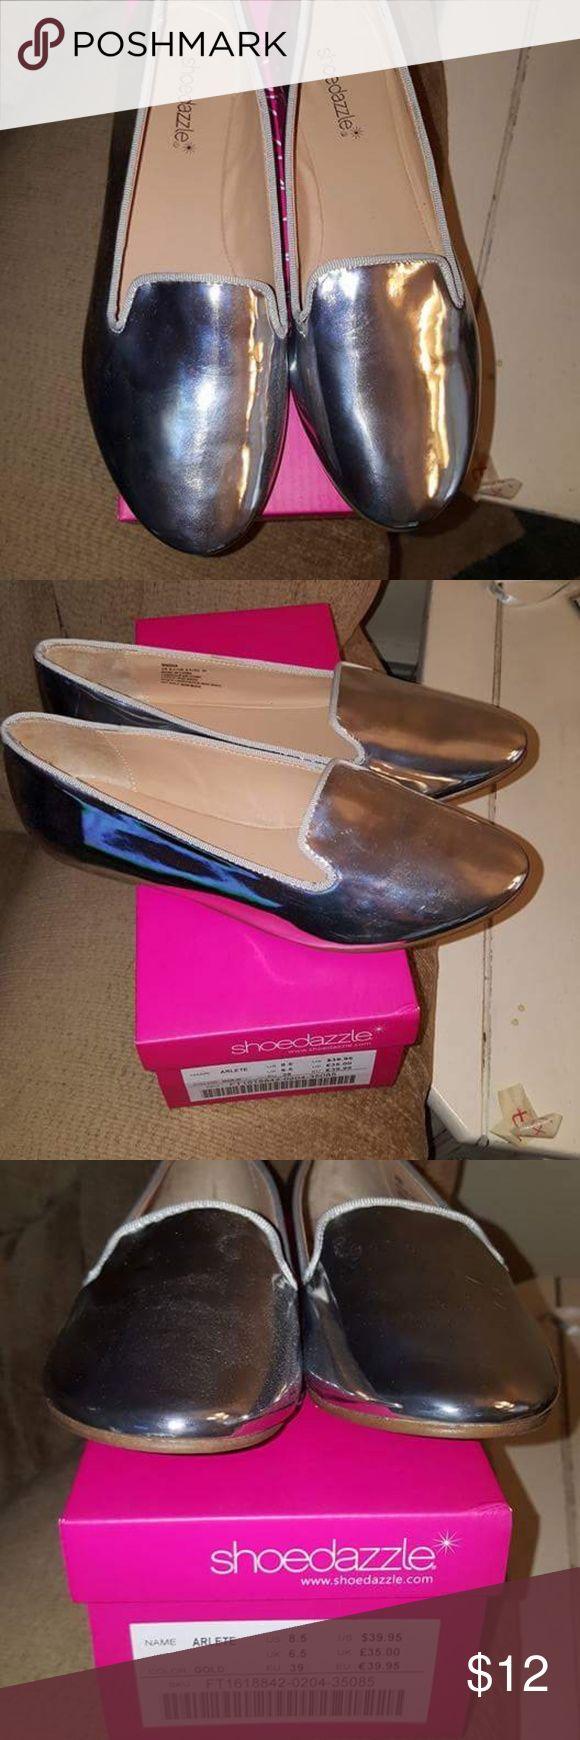 "Shoe Dazzle ""Maisha"" metallic silver flats 8.5 Never worn outside.   Shiny, silver patent leather! Shoe Dazzle Shoes Flats & Loafers"